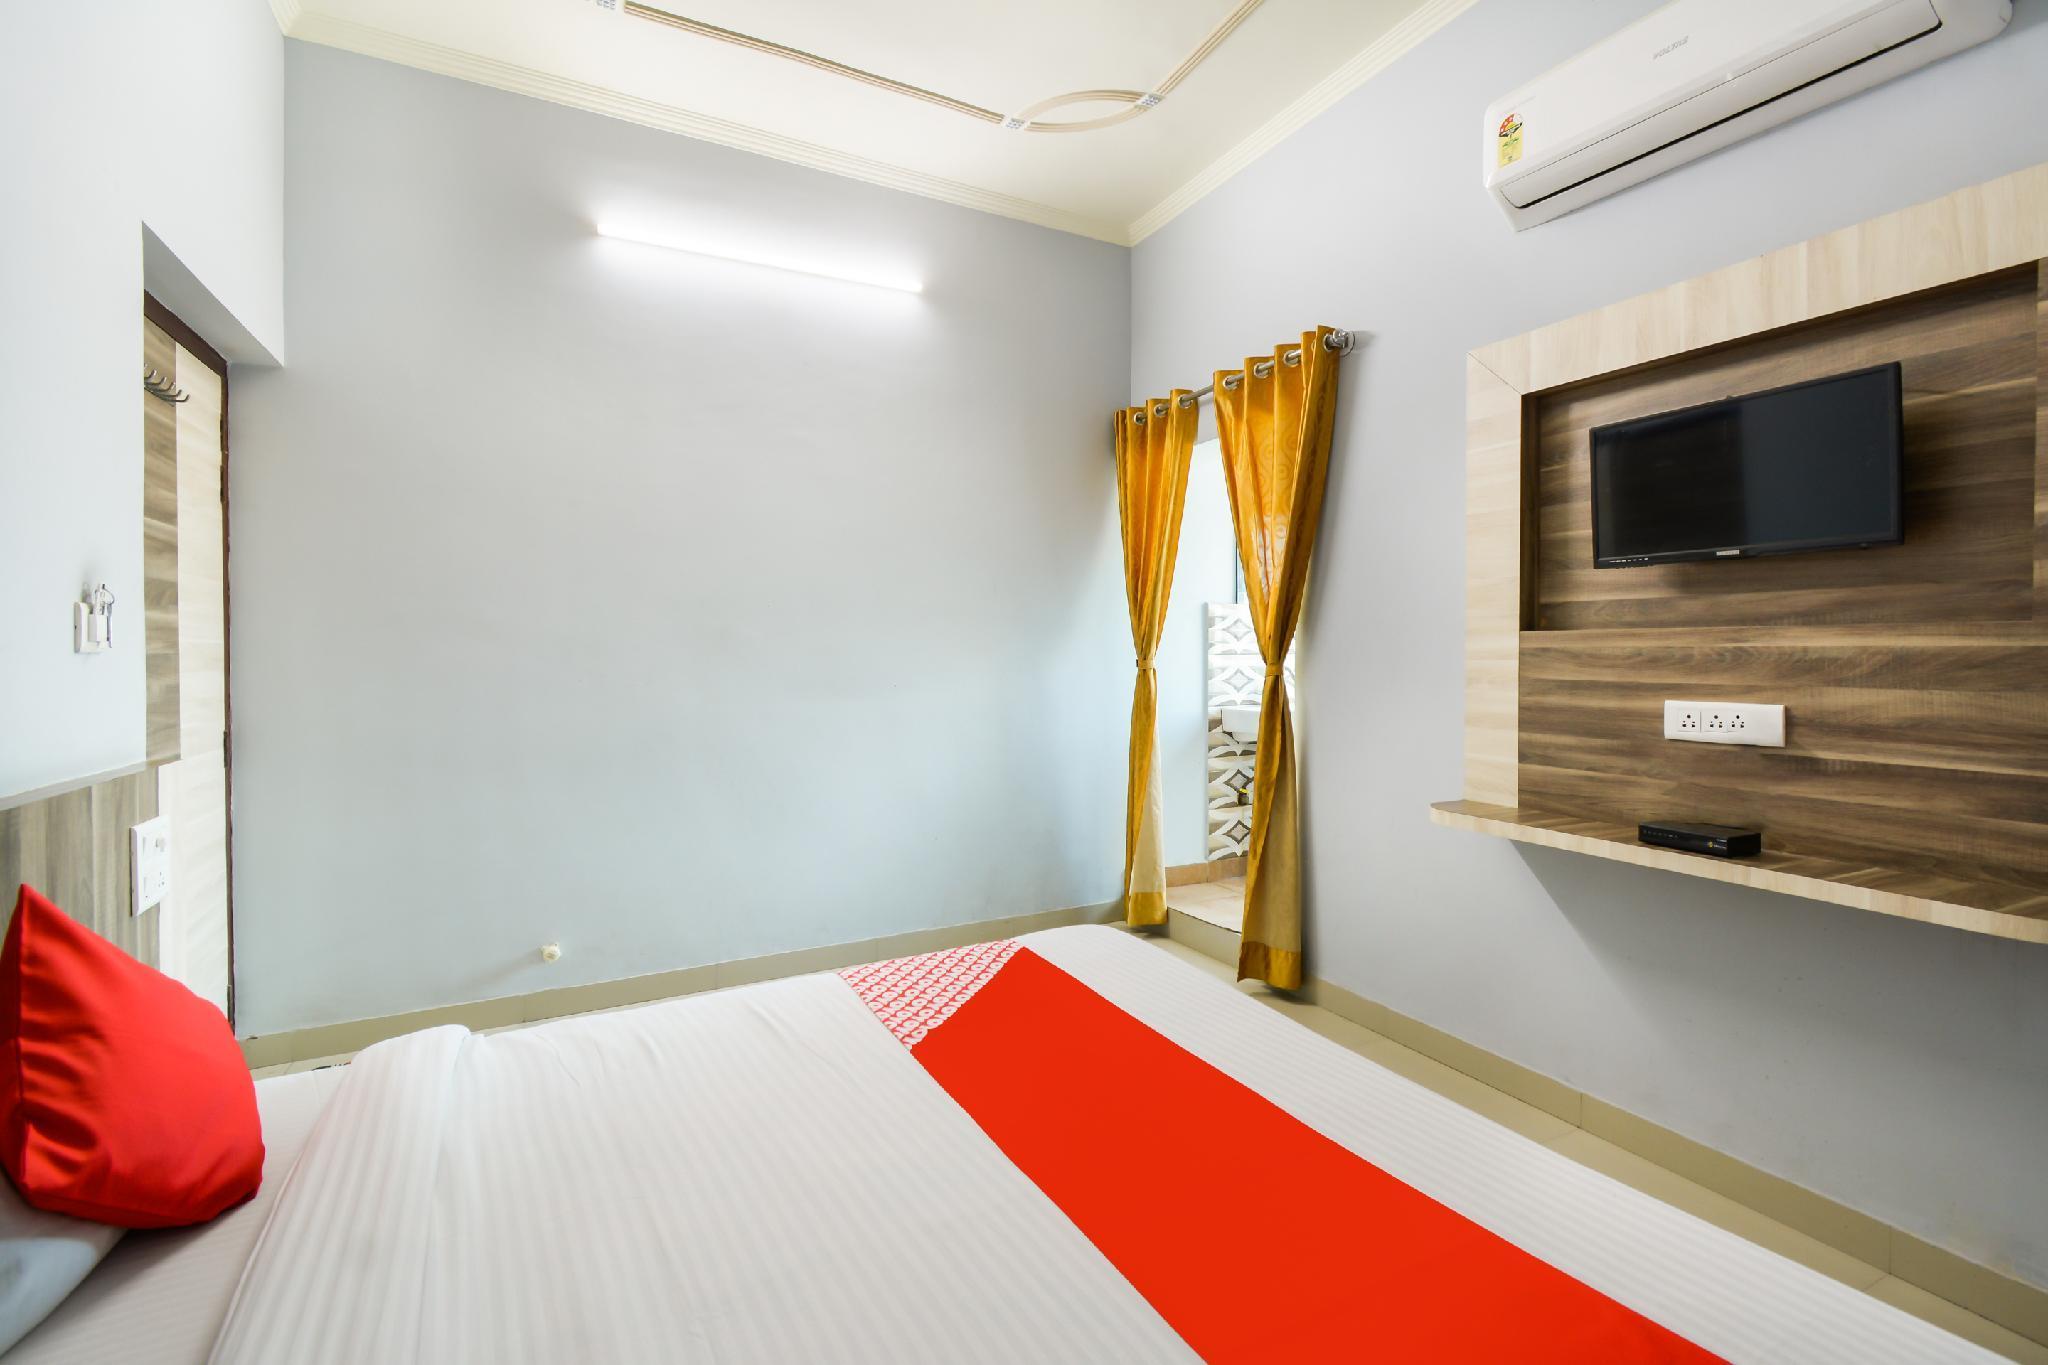 OYO 65676 Rj18 Hotel And Family Restaurant